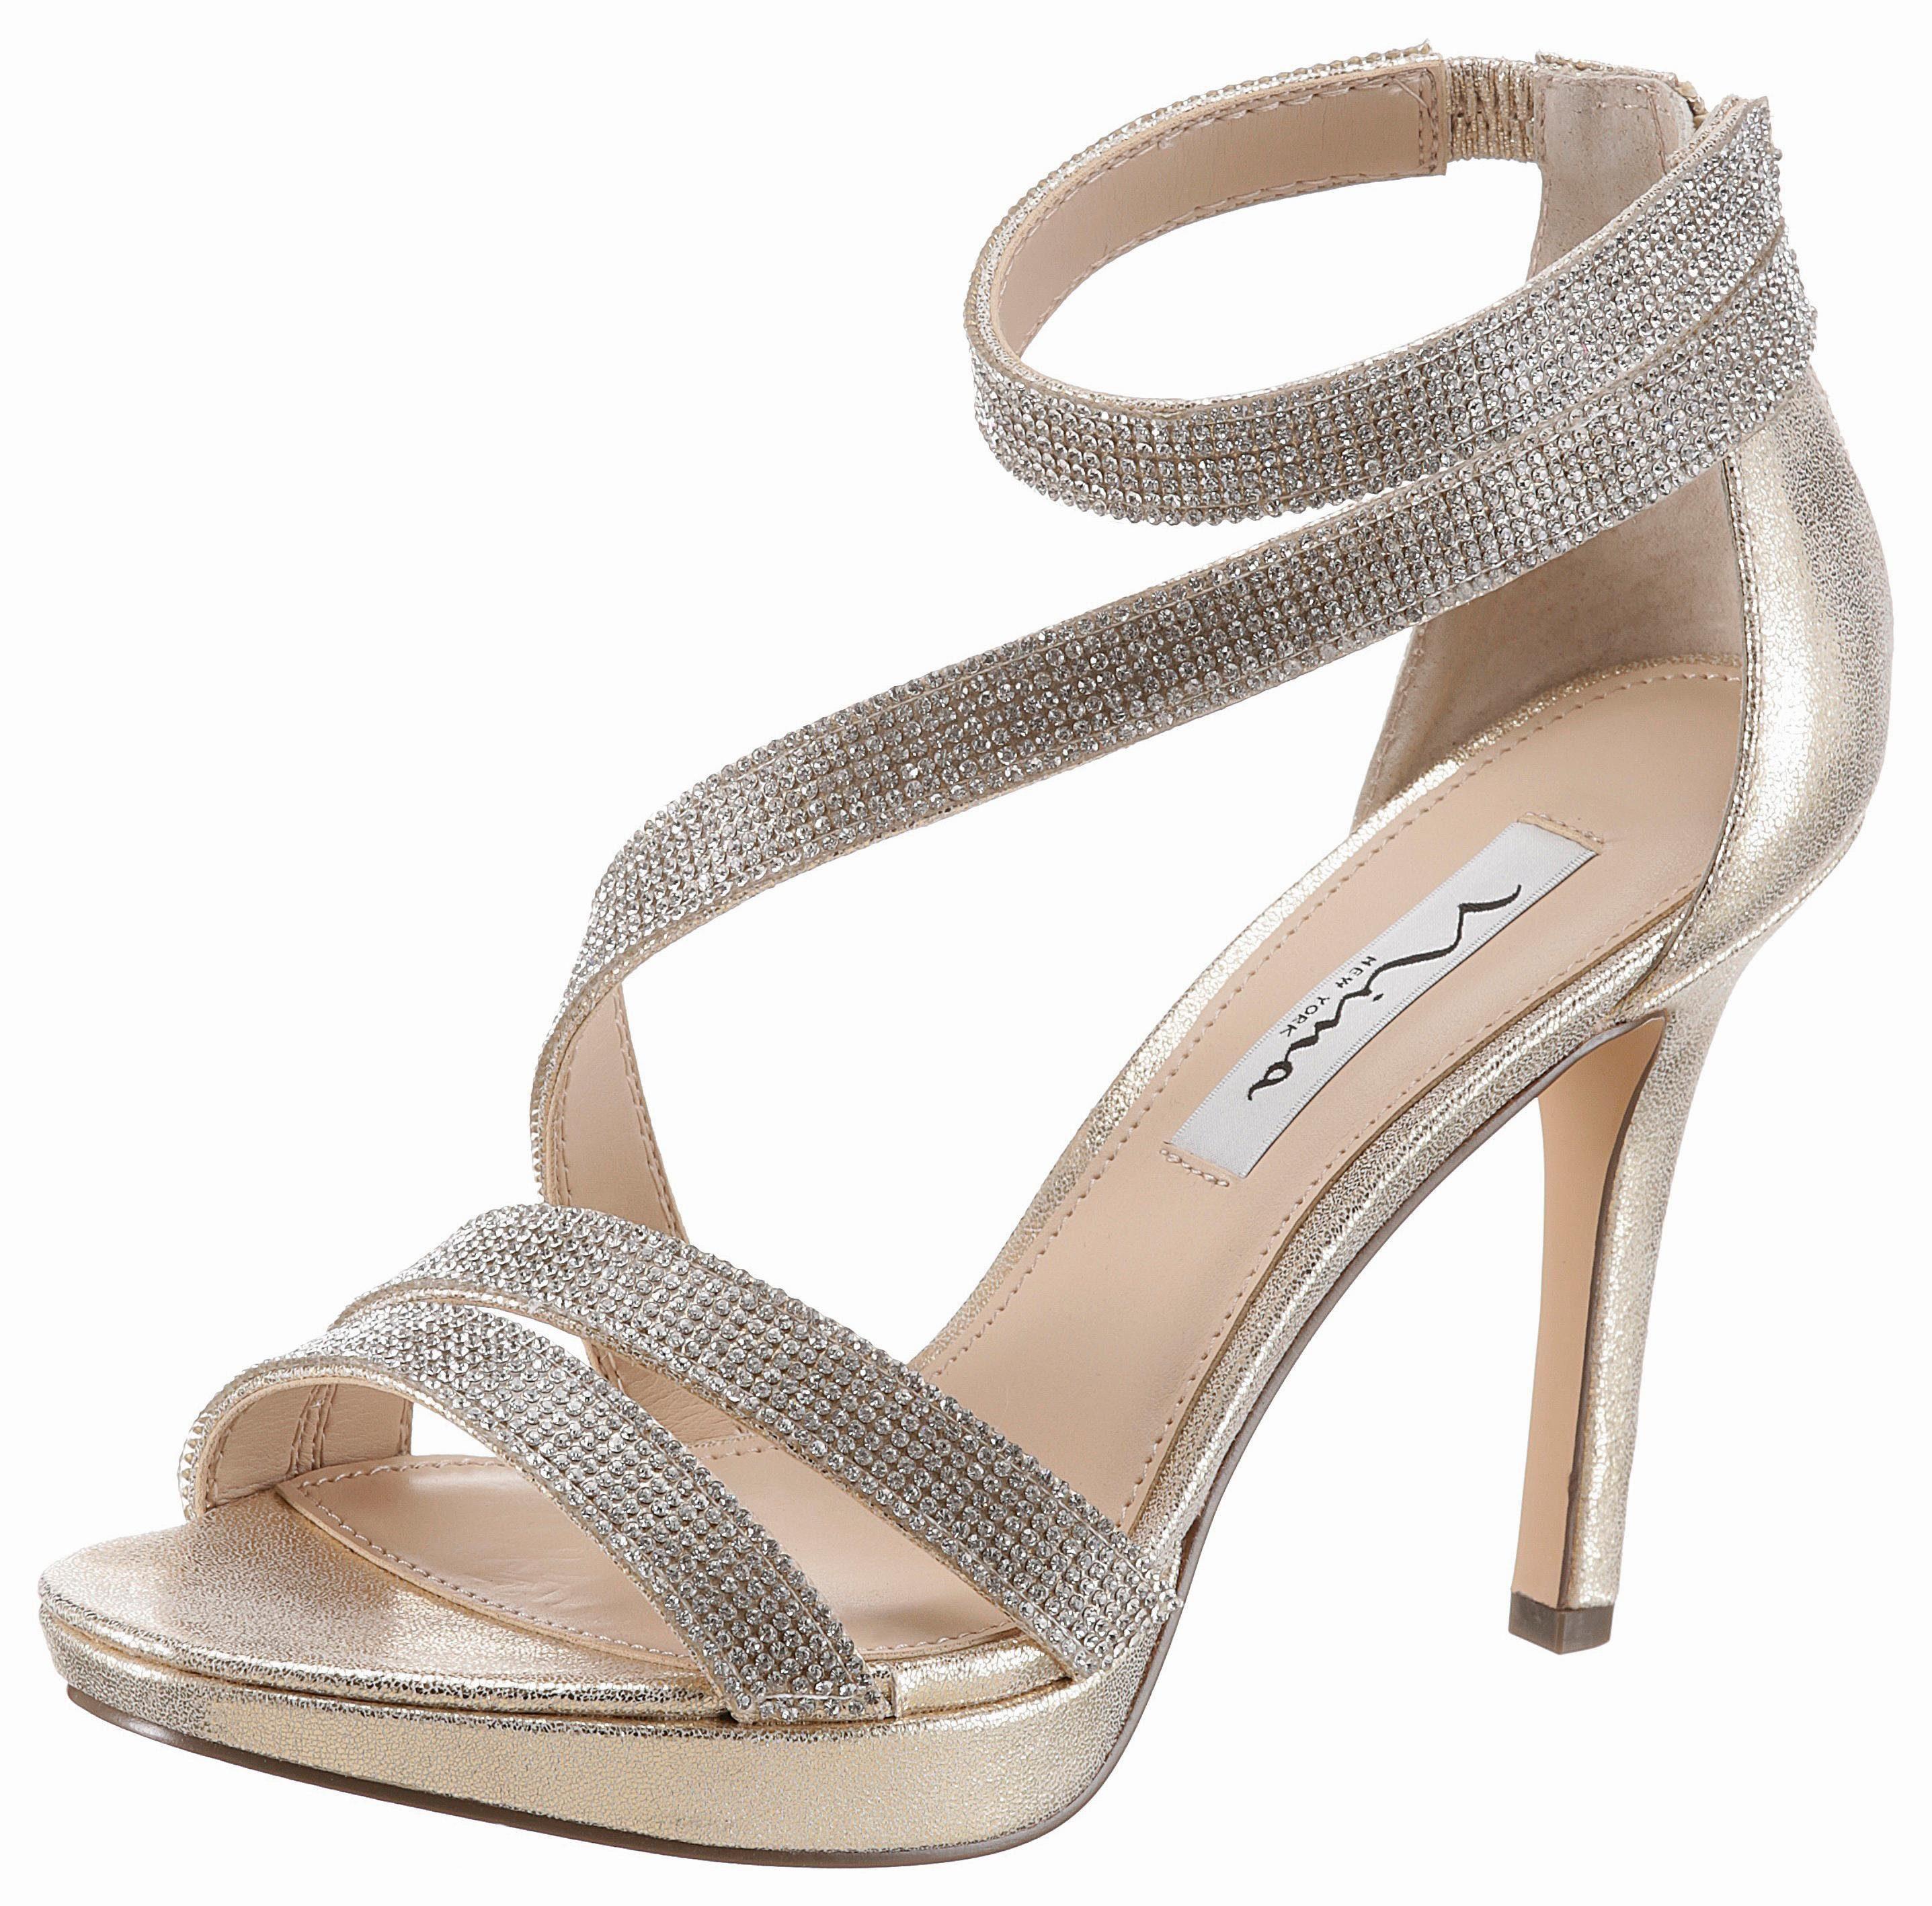 Nine West »Dempsey« High-Heel-Sandalette, im schimmernden Look, goldfarben, goldfarben